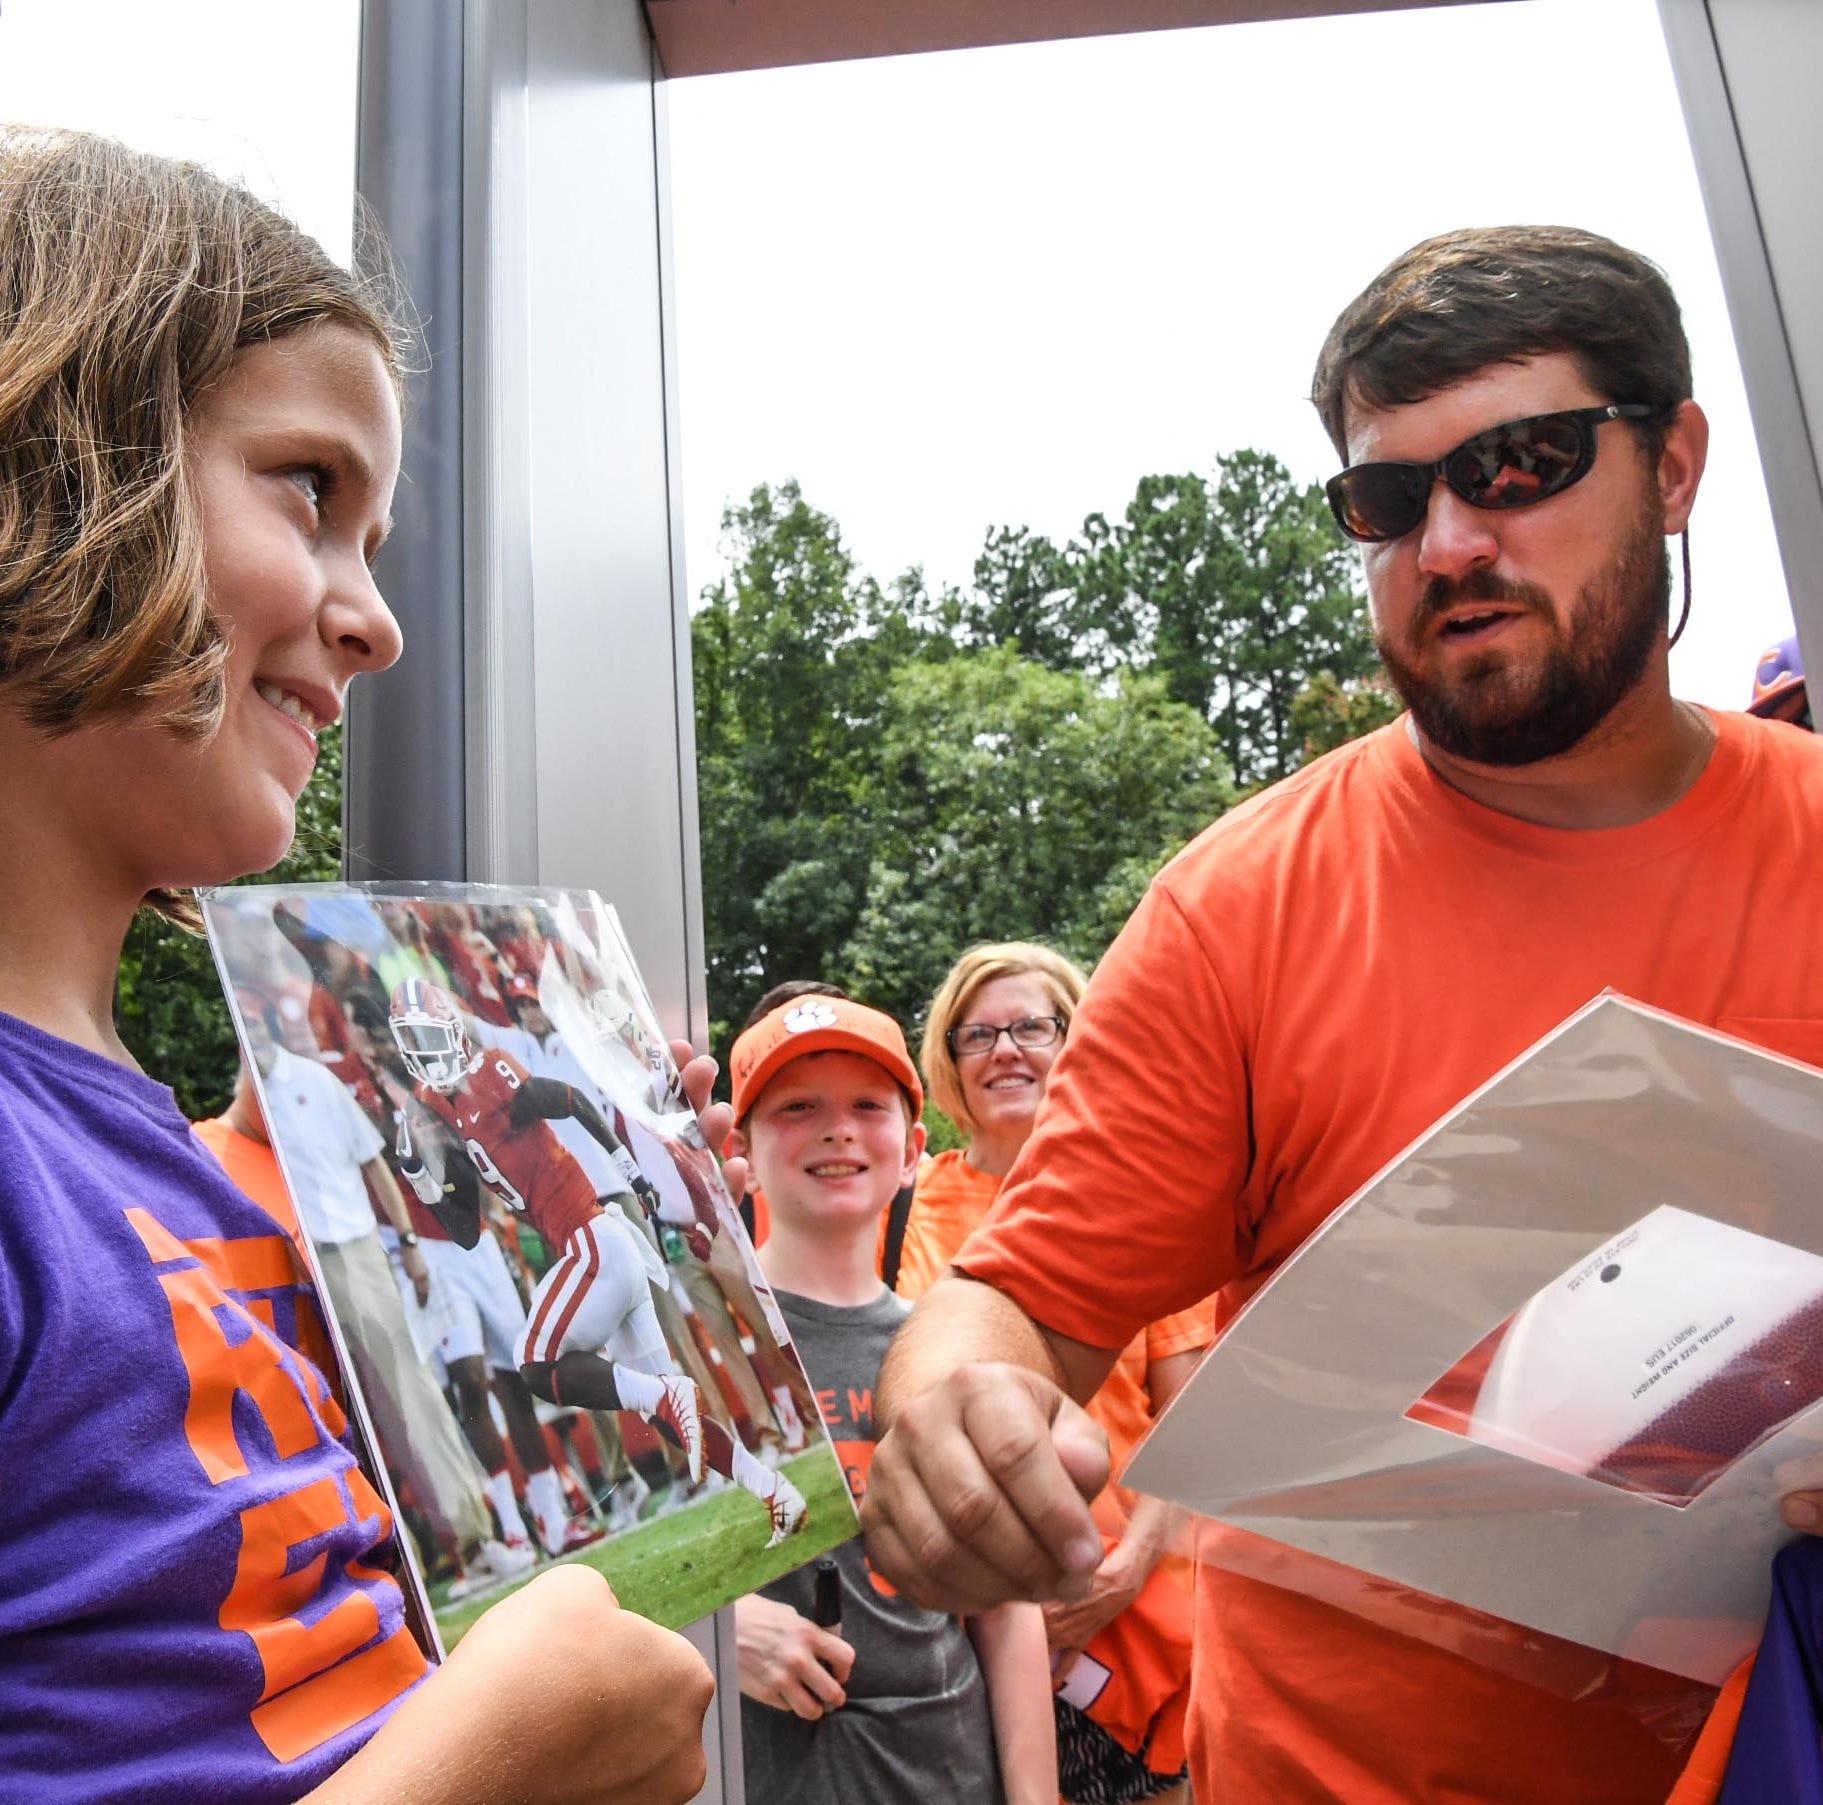 Fan Day provides bonding experience for Clemson football-loving families